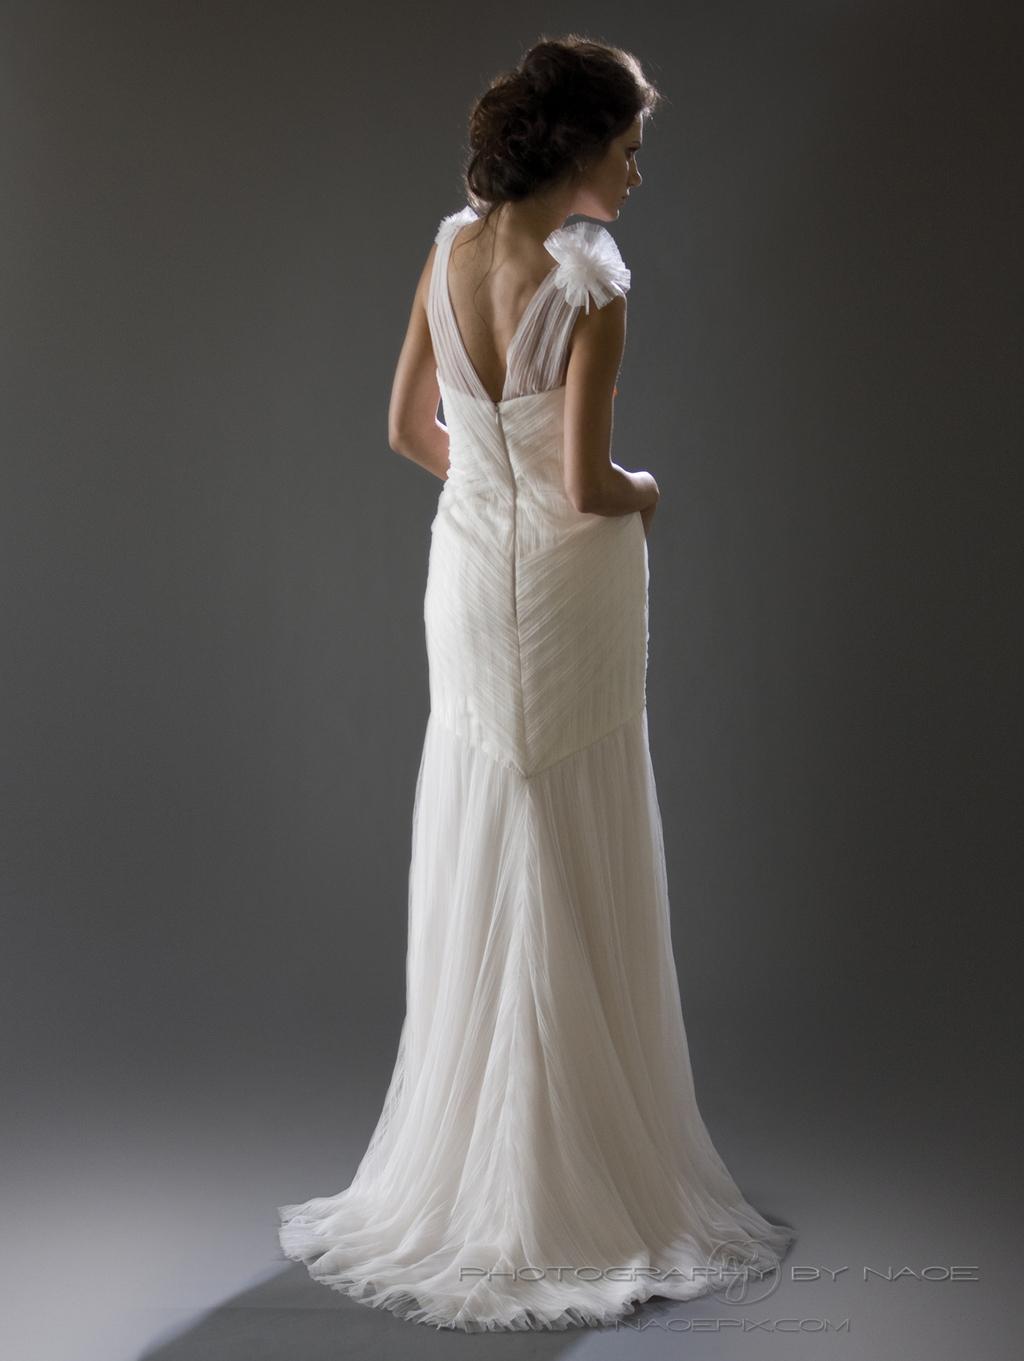 Wedding-dress-spring-2013-bridal_gown-cocoe-voci-10-back.full